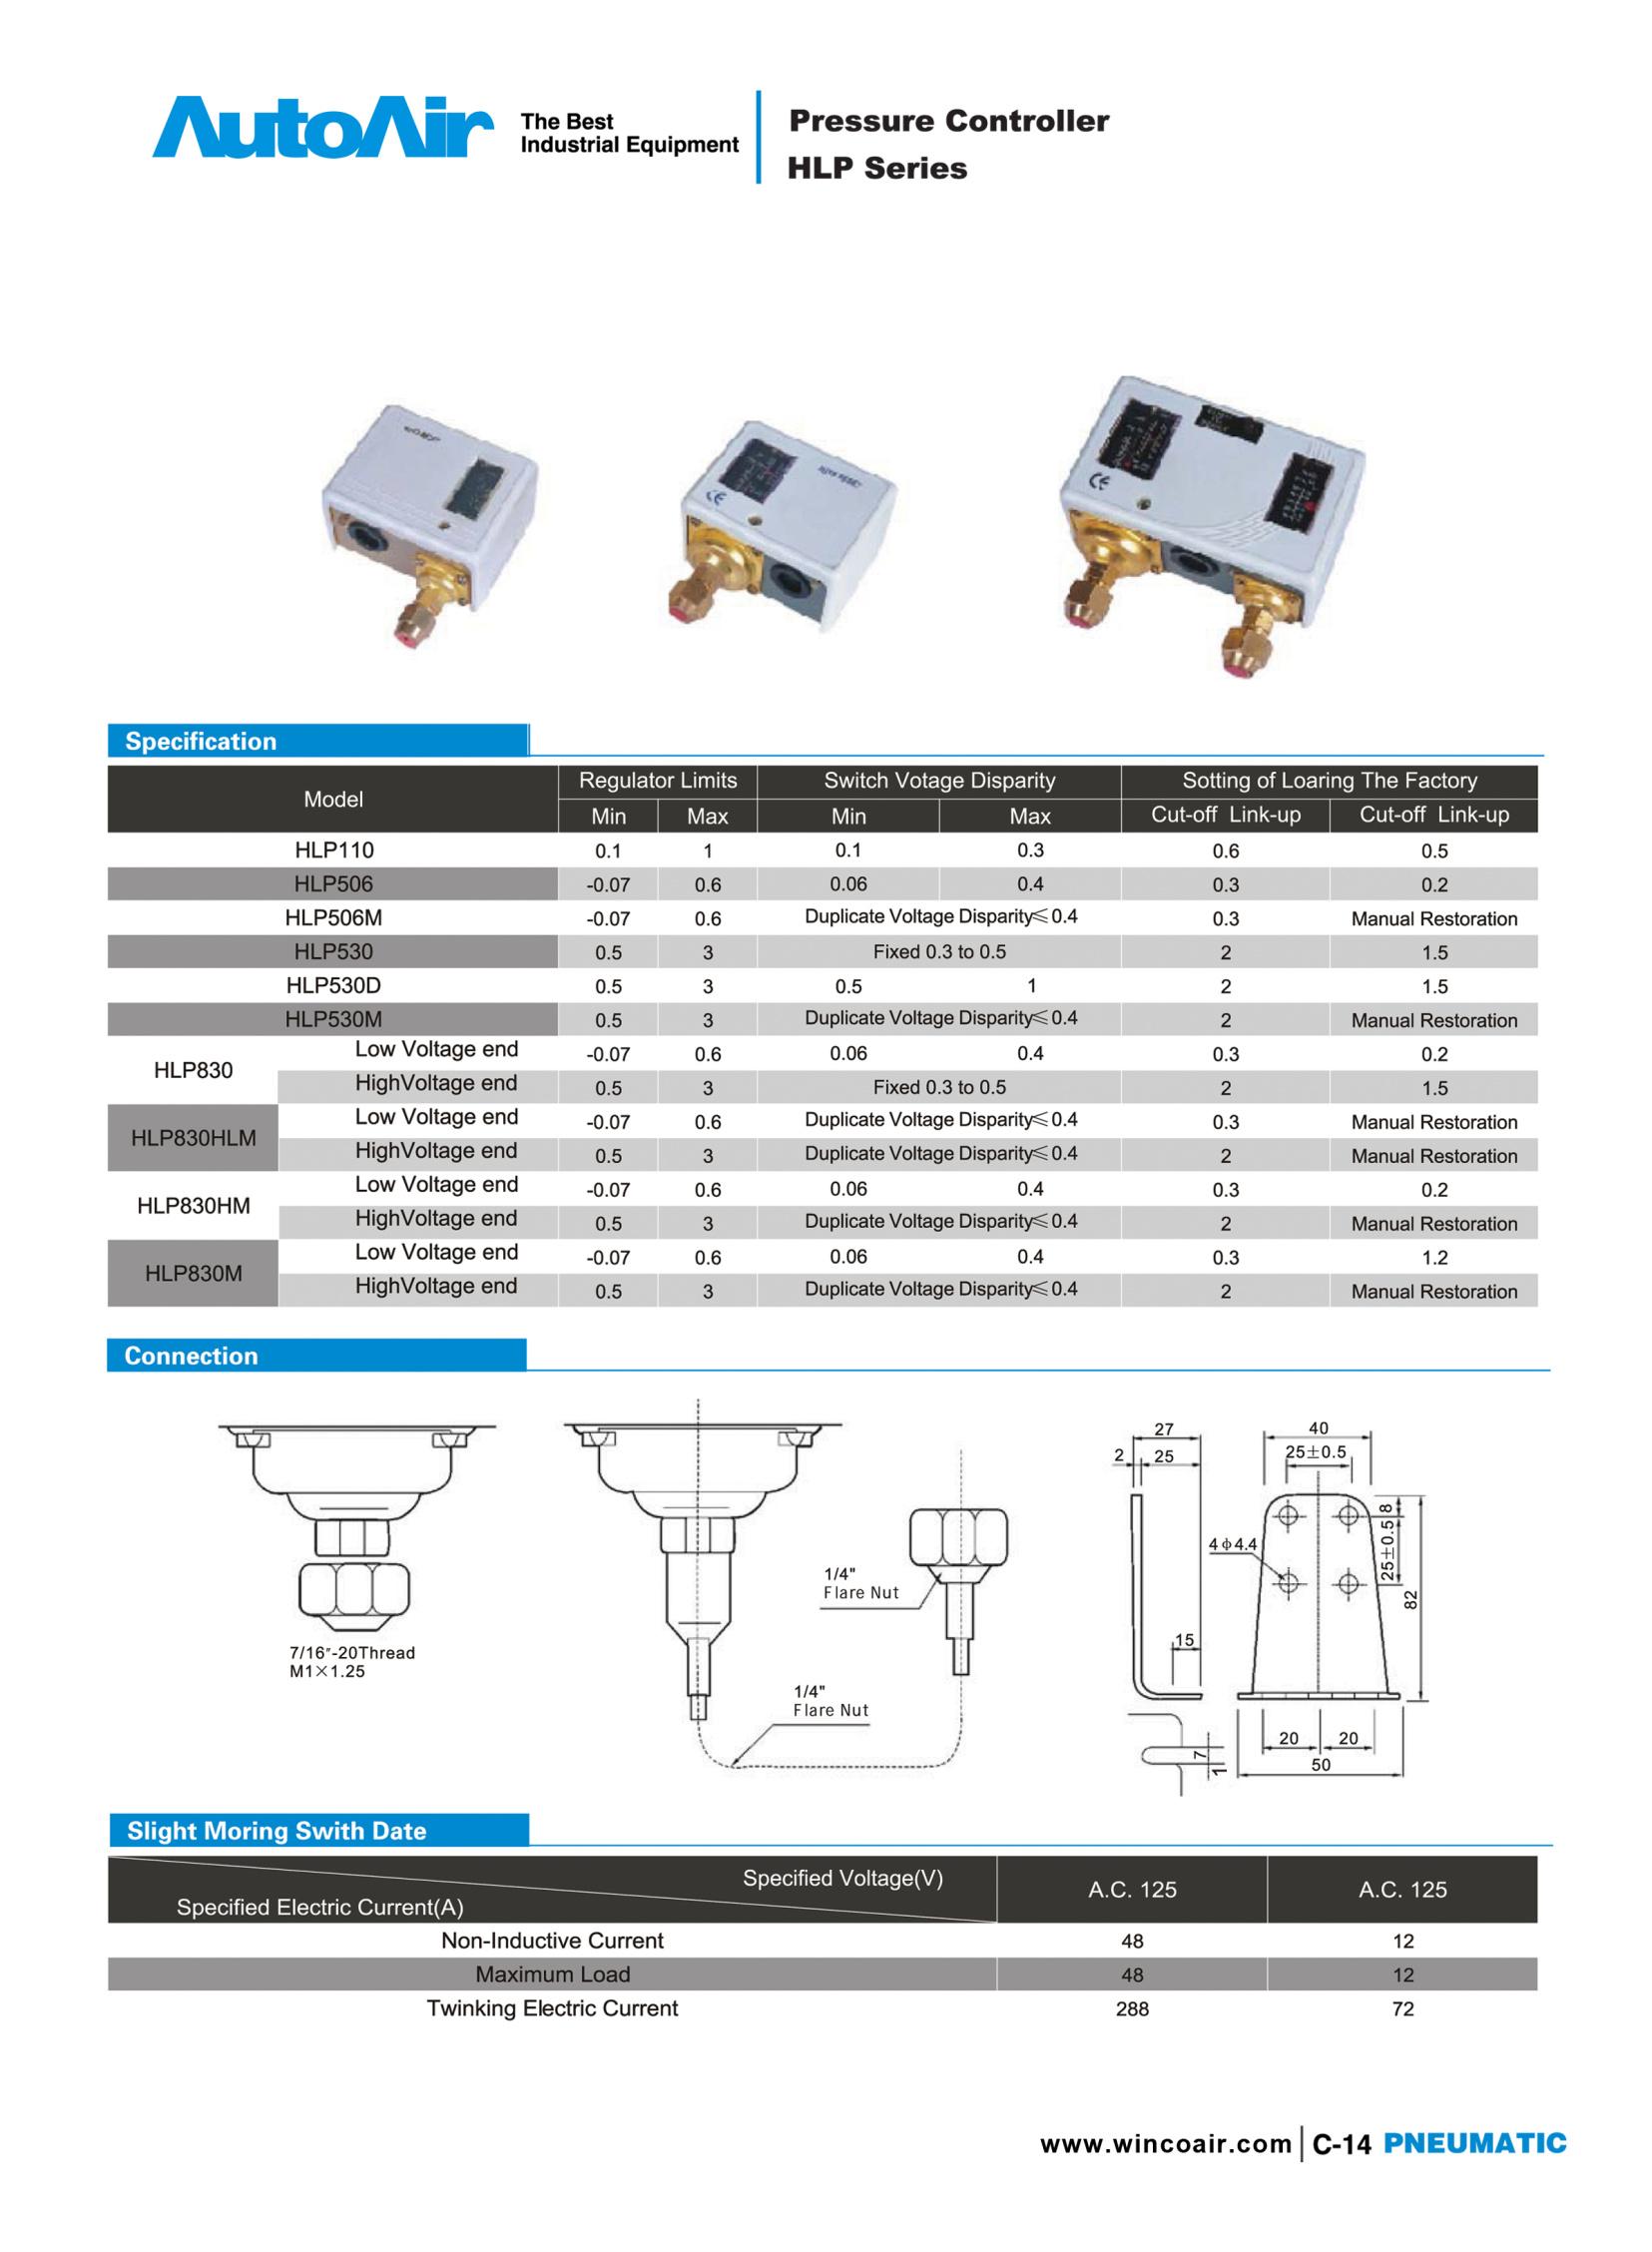 water valve(14)